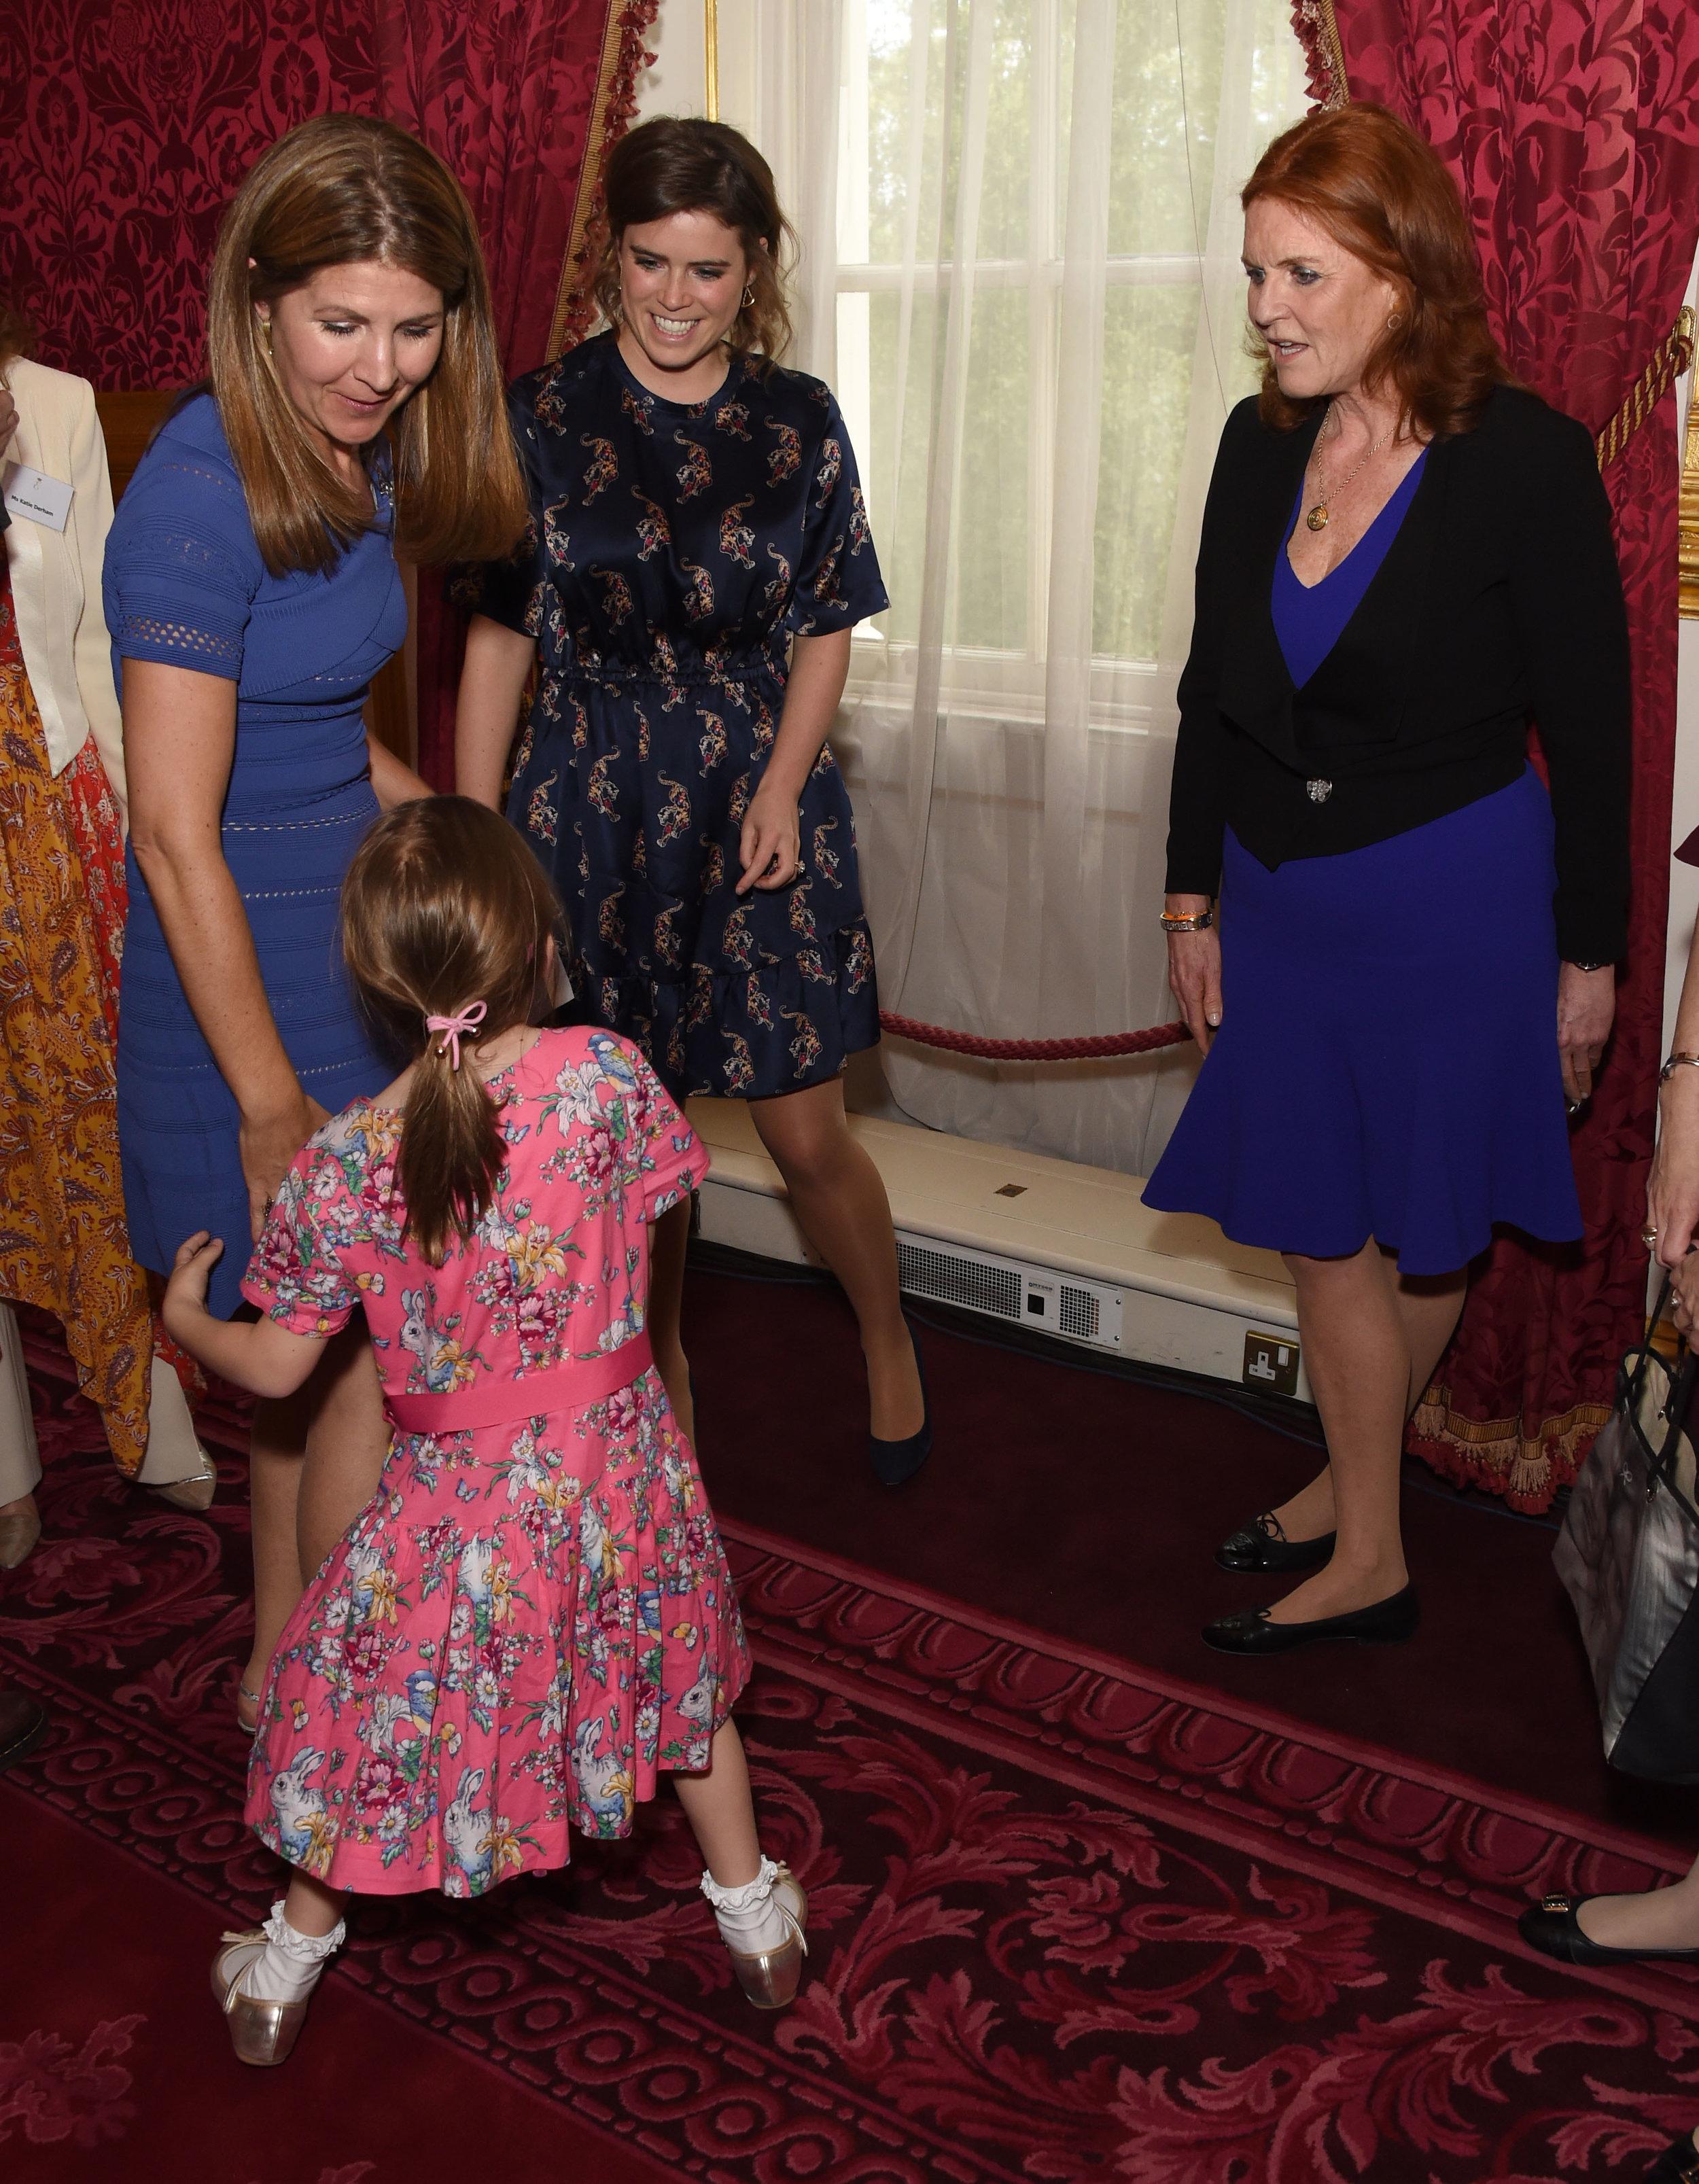 Alice Ashton, Oscar's little sister, Viveka Alvestrand, co-founder of Oscar's Book Prize, with HRH Princess Eugenie and Sarah, Duchess of York. Image: Dave Benett